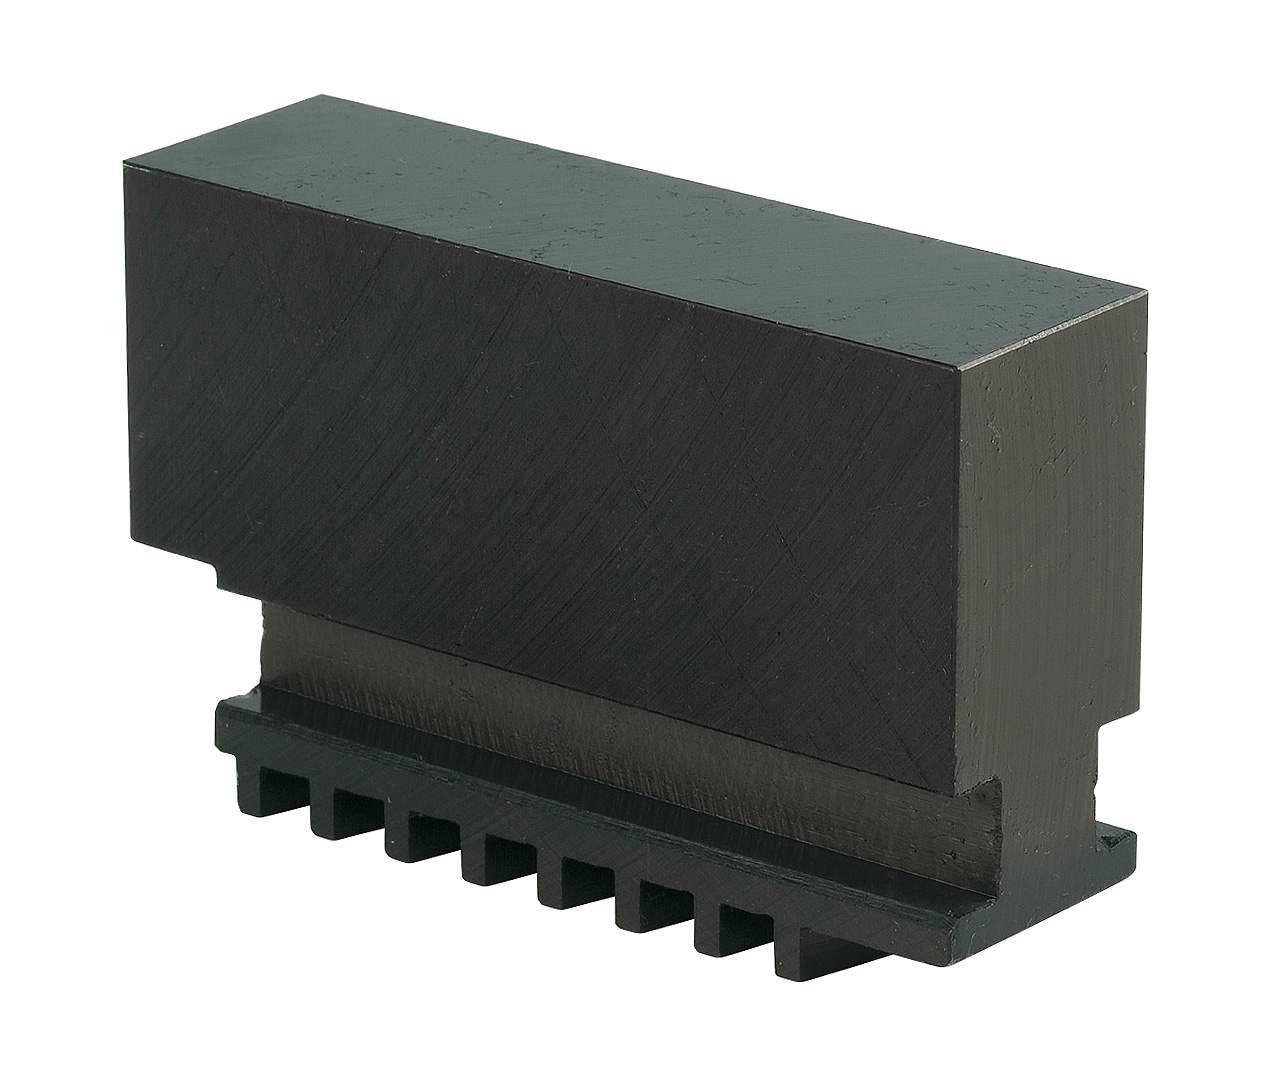 Szczęki jednolite miękkie - komplet DSJ-DK11-630 BERNARDO